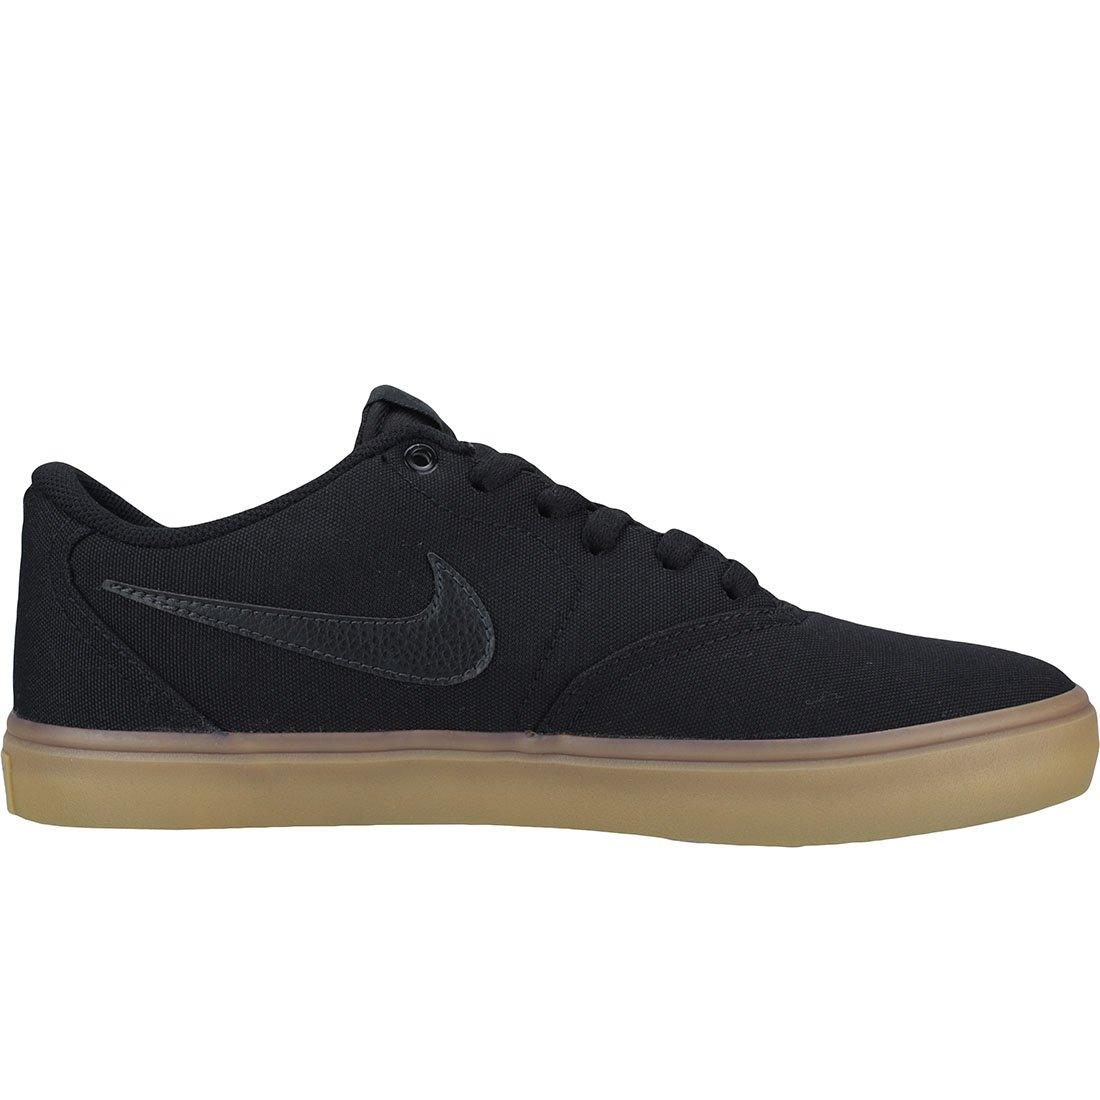 Nike Men's SB Check Solarsoft Canvas Skateboarding Shoes Black/Black-Gum Light Brown 10 by Nike (Image #6)